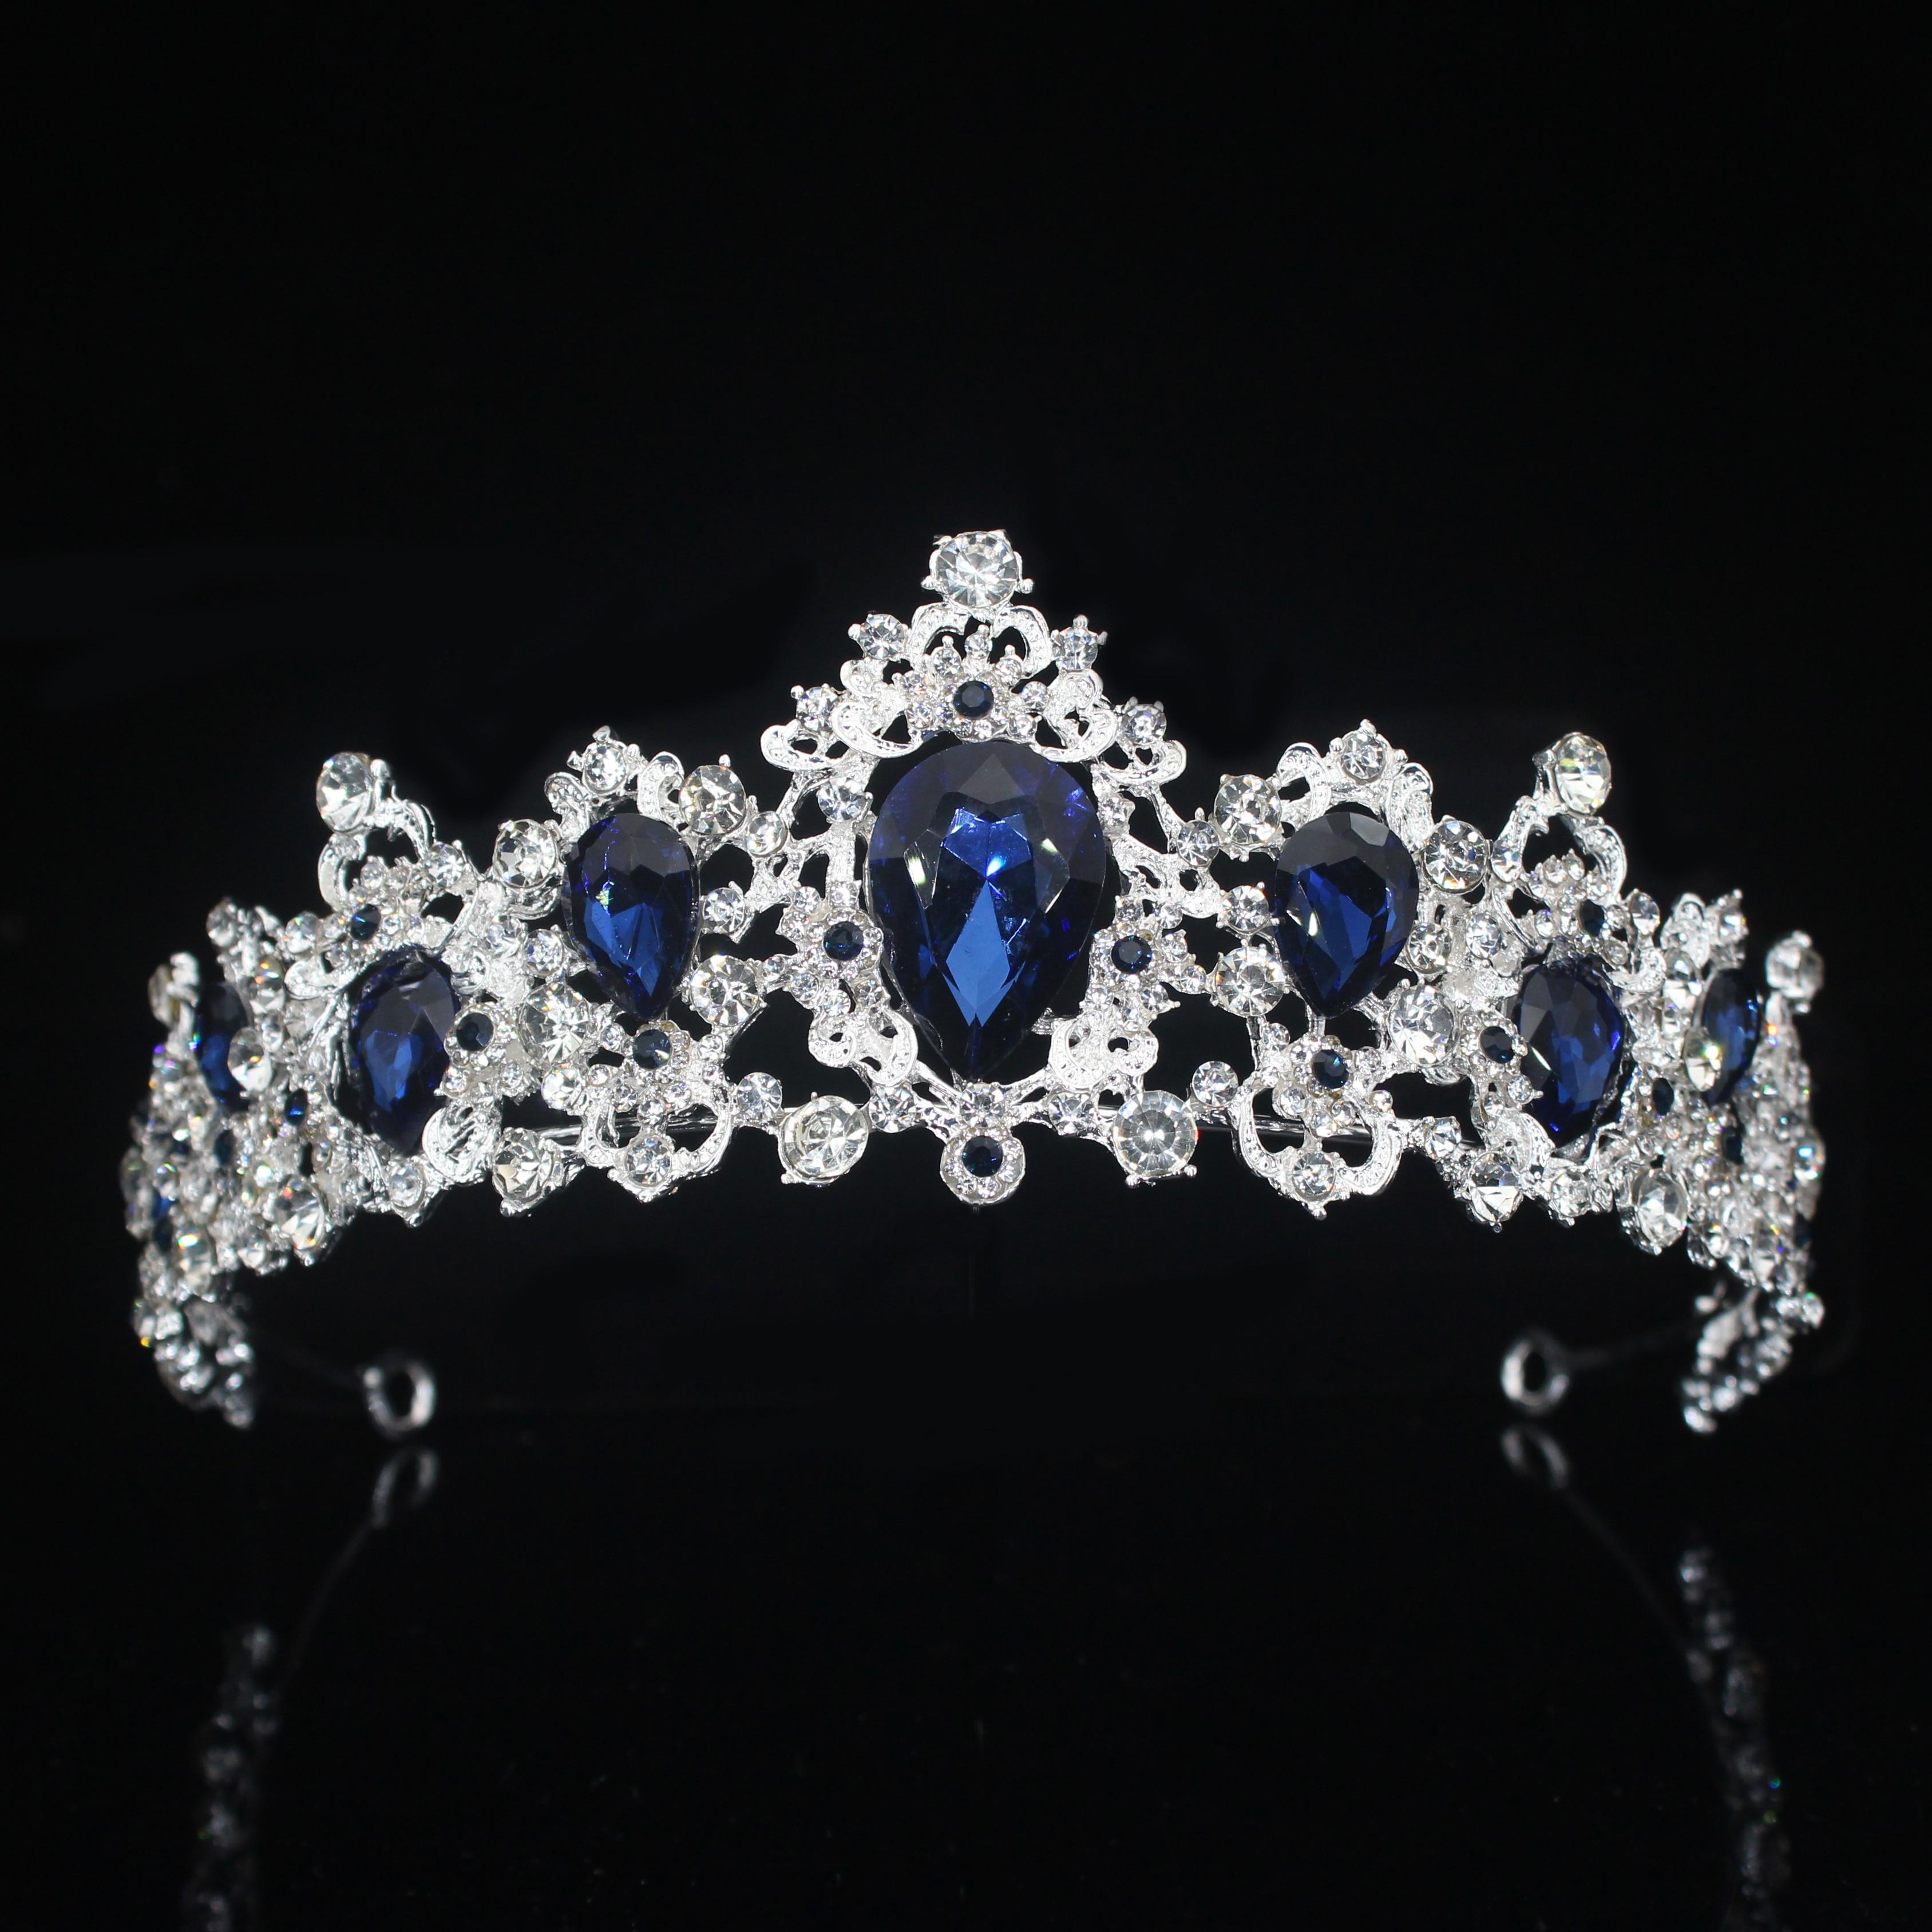 Tiara de corona nupcial de cristal para mujer, accesorios de joyas para...